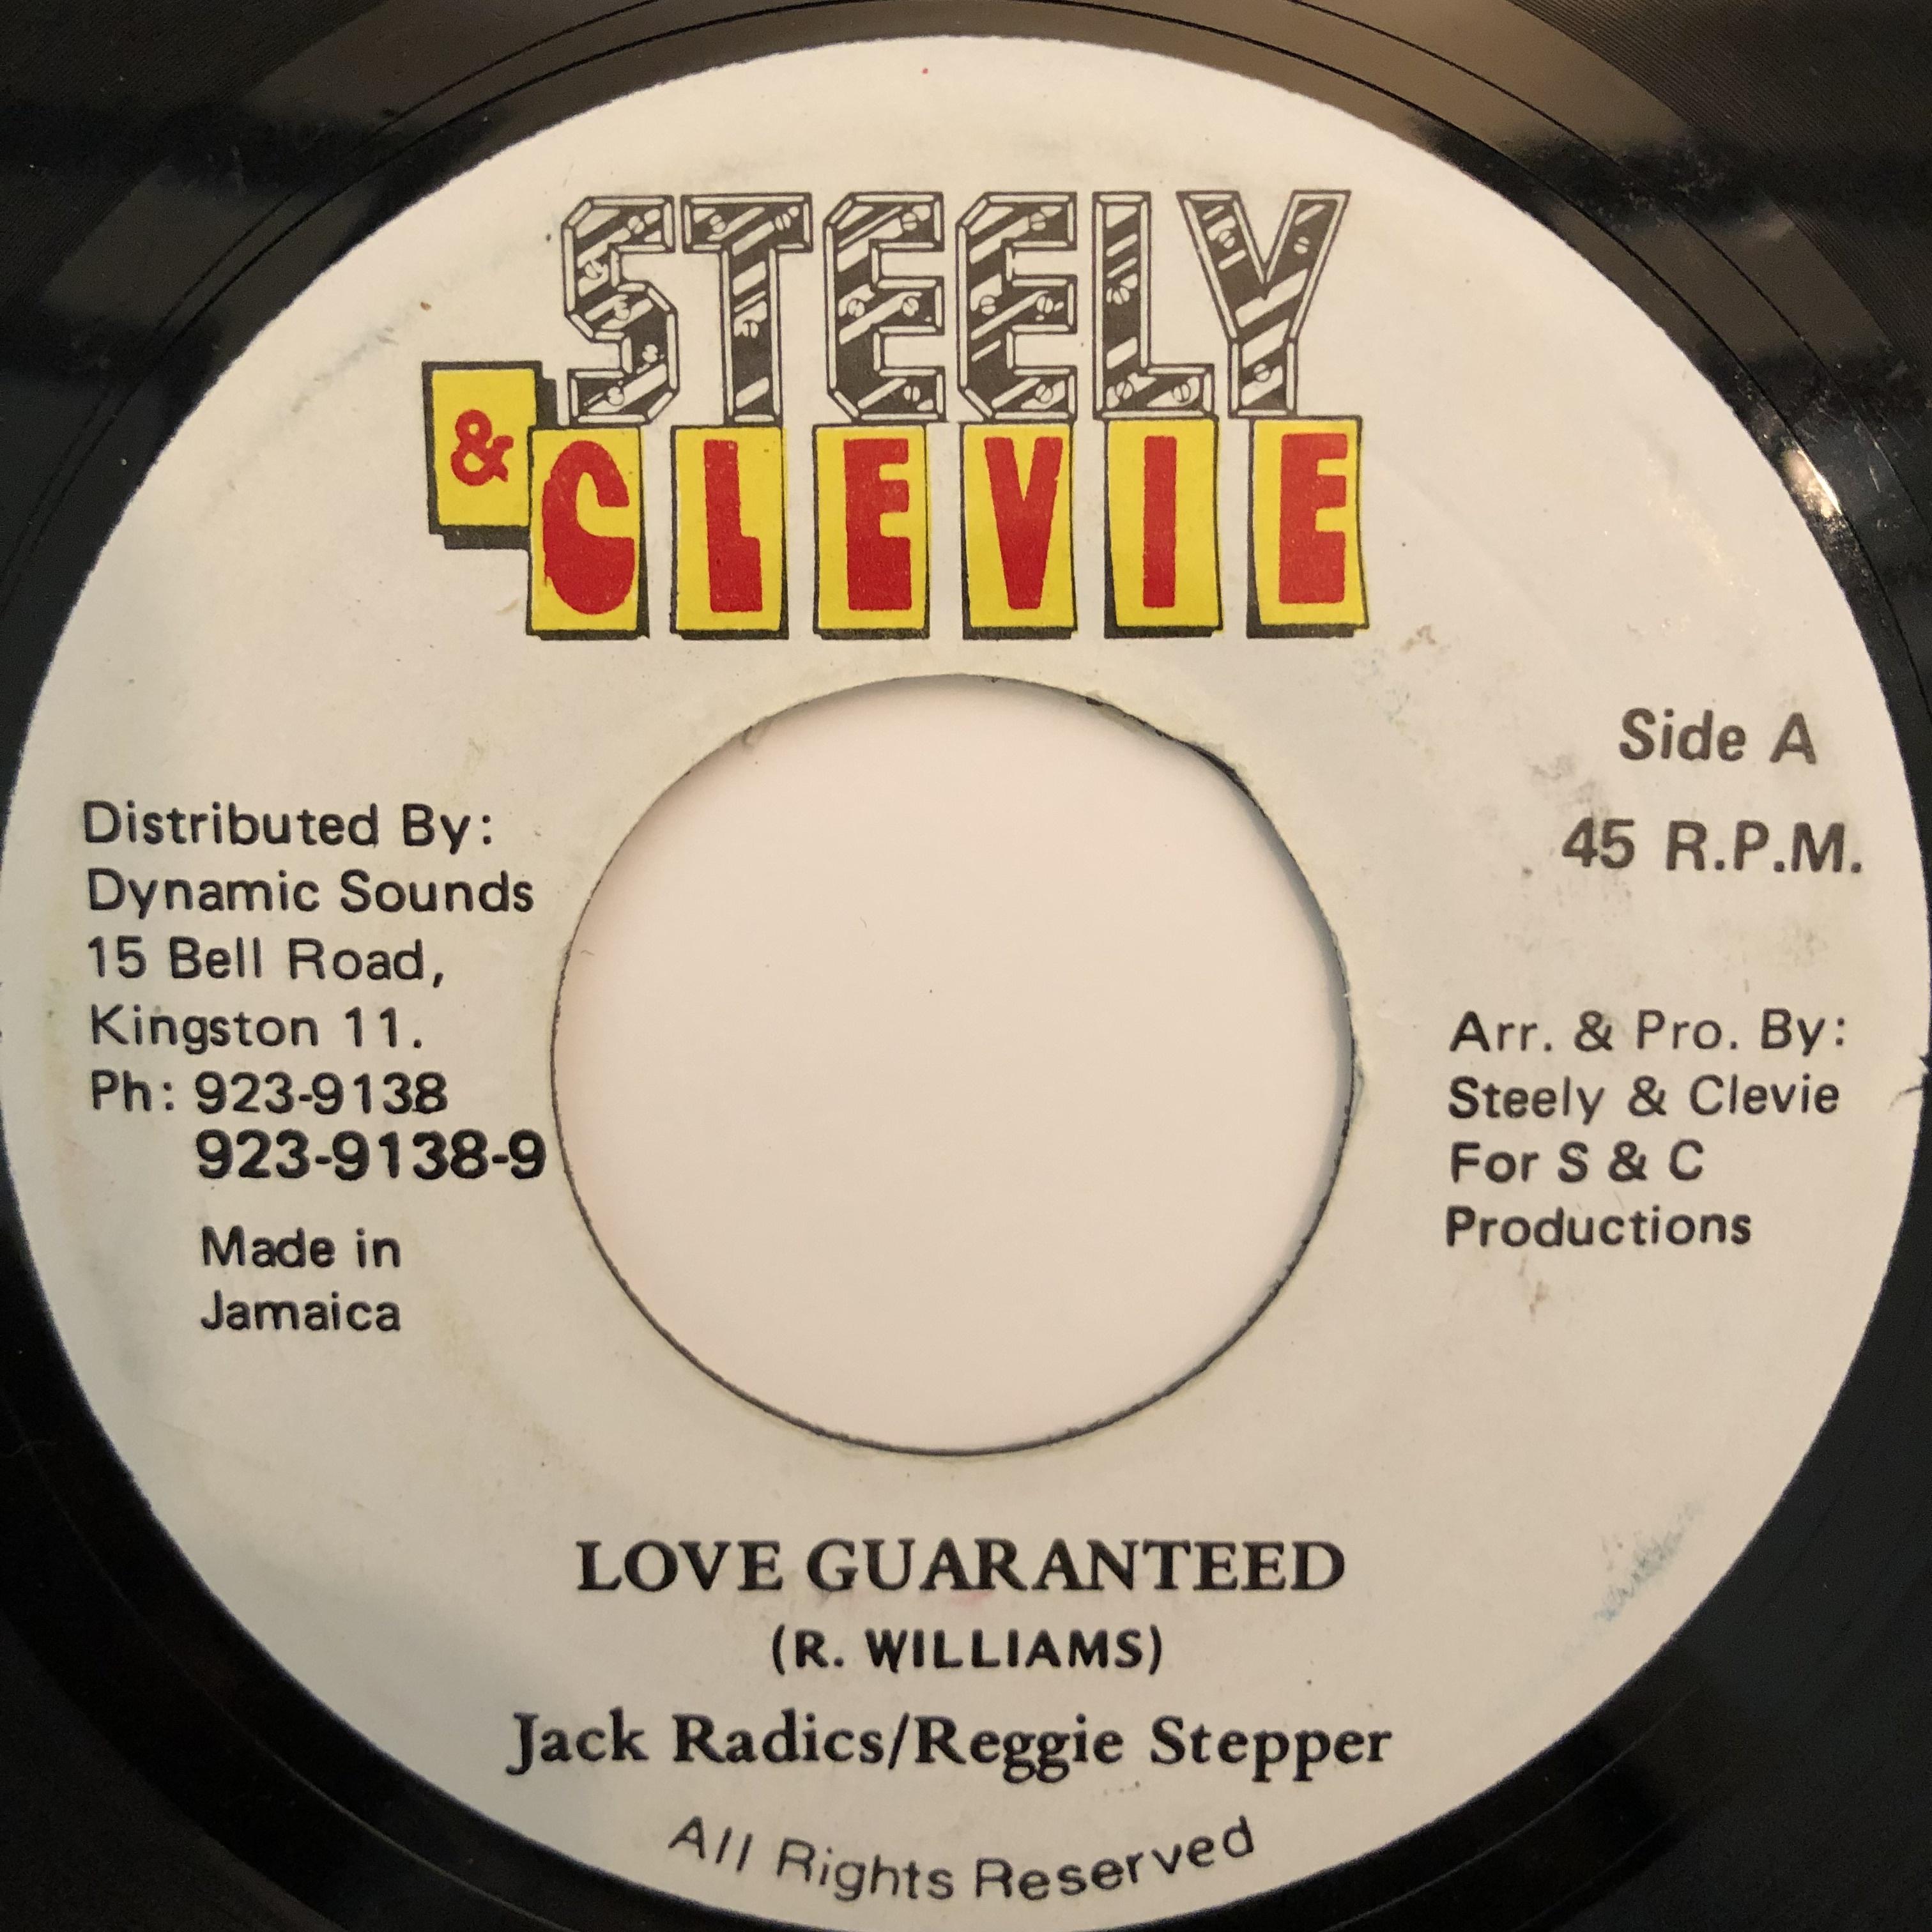 Jack Radics, Reggie Stepper - Love Guaranteed【7-20315】